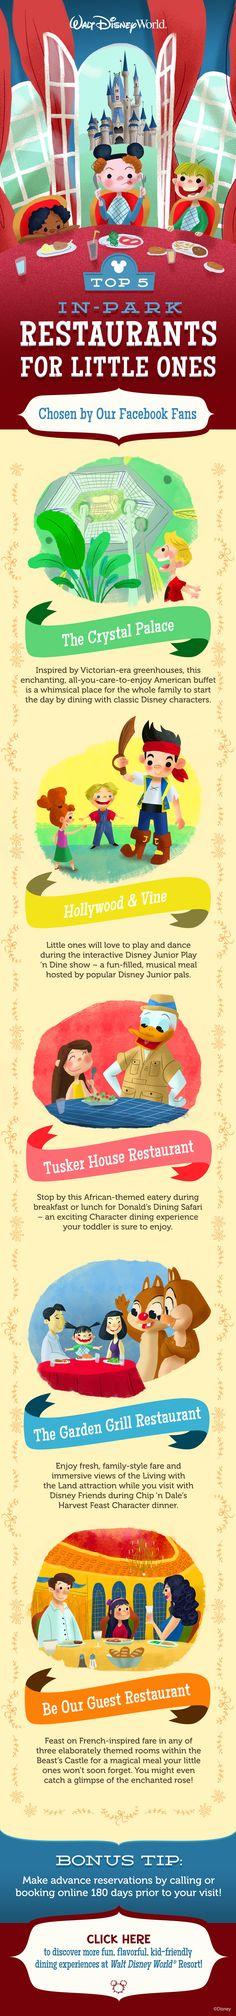 Top 5 In-Park Restaurants for Preschoolers at Walt Disney World chosen by our Facebook fans!